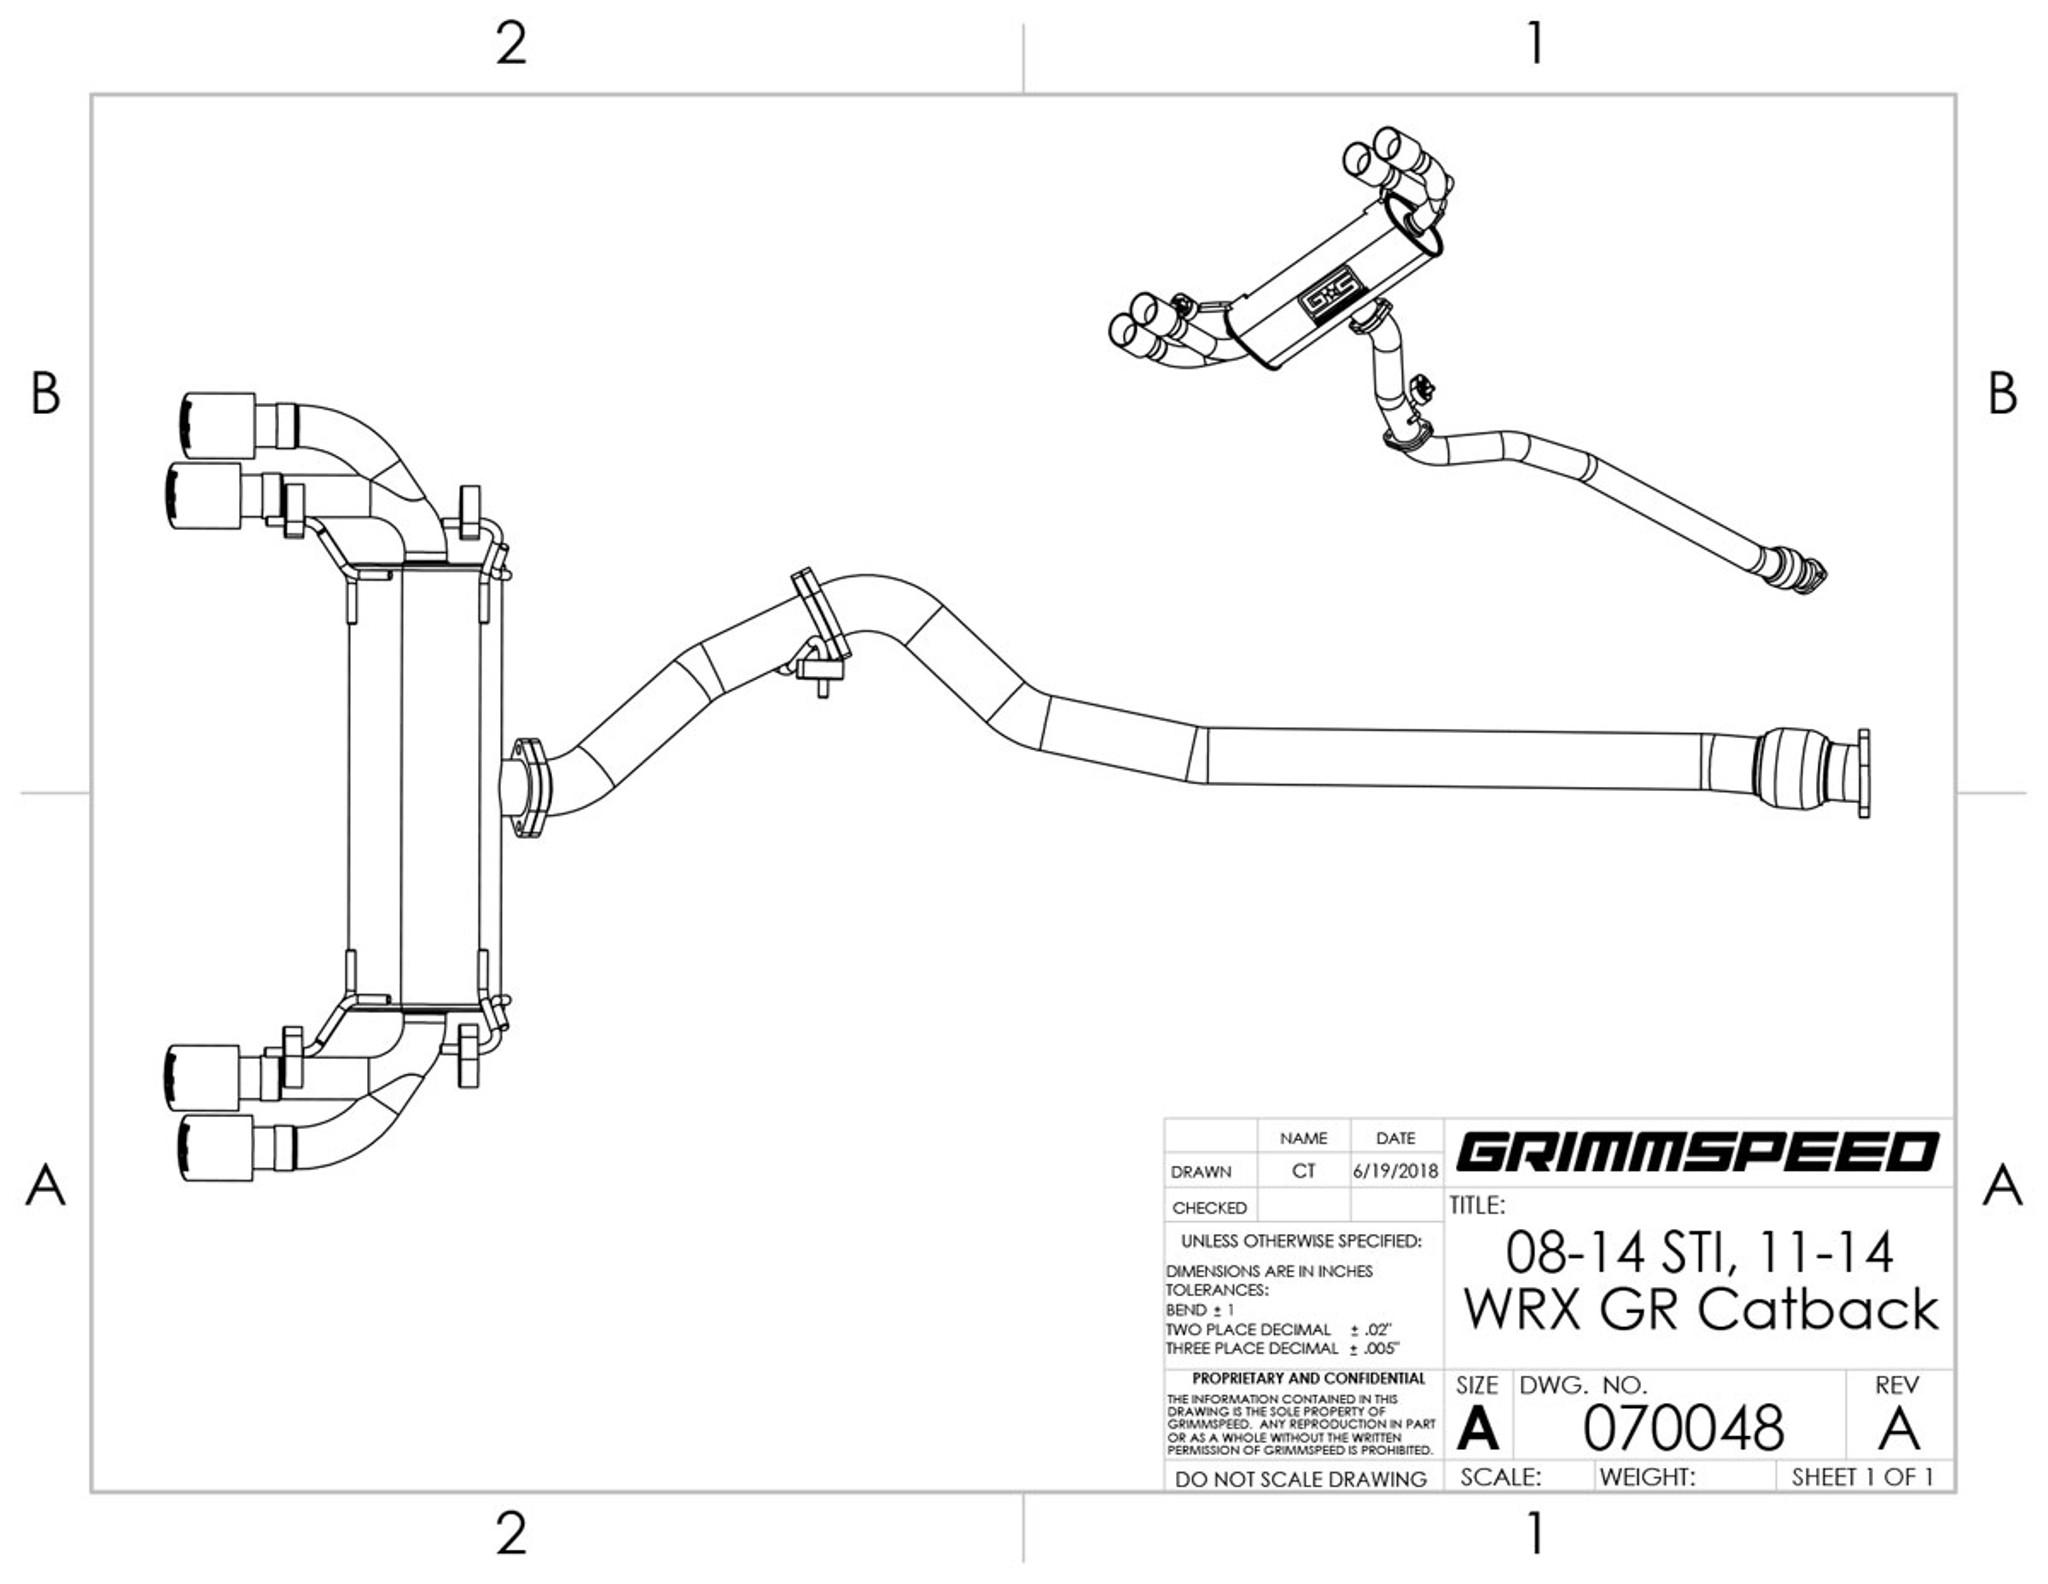 catback exhaust system un resonated 11 14 wrx 08 14 sti hatchback